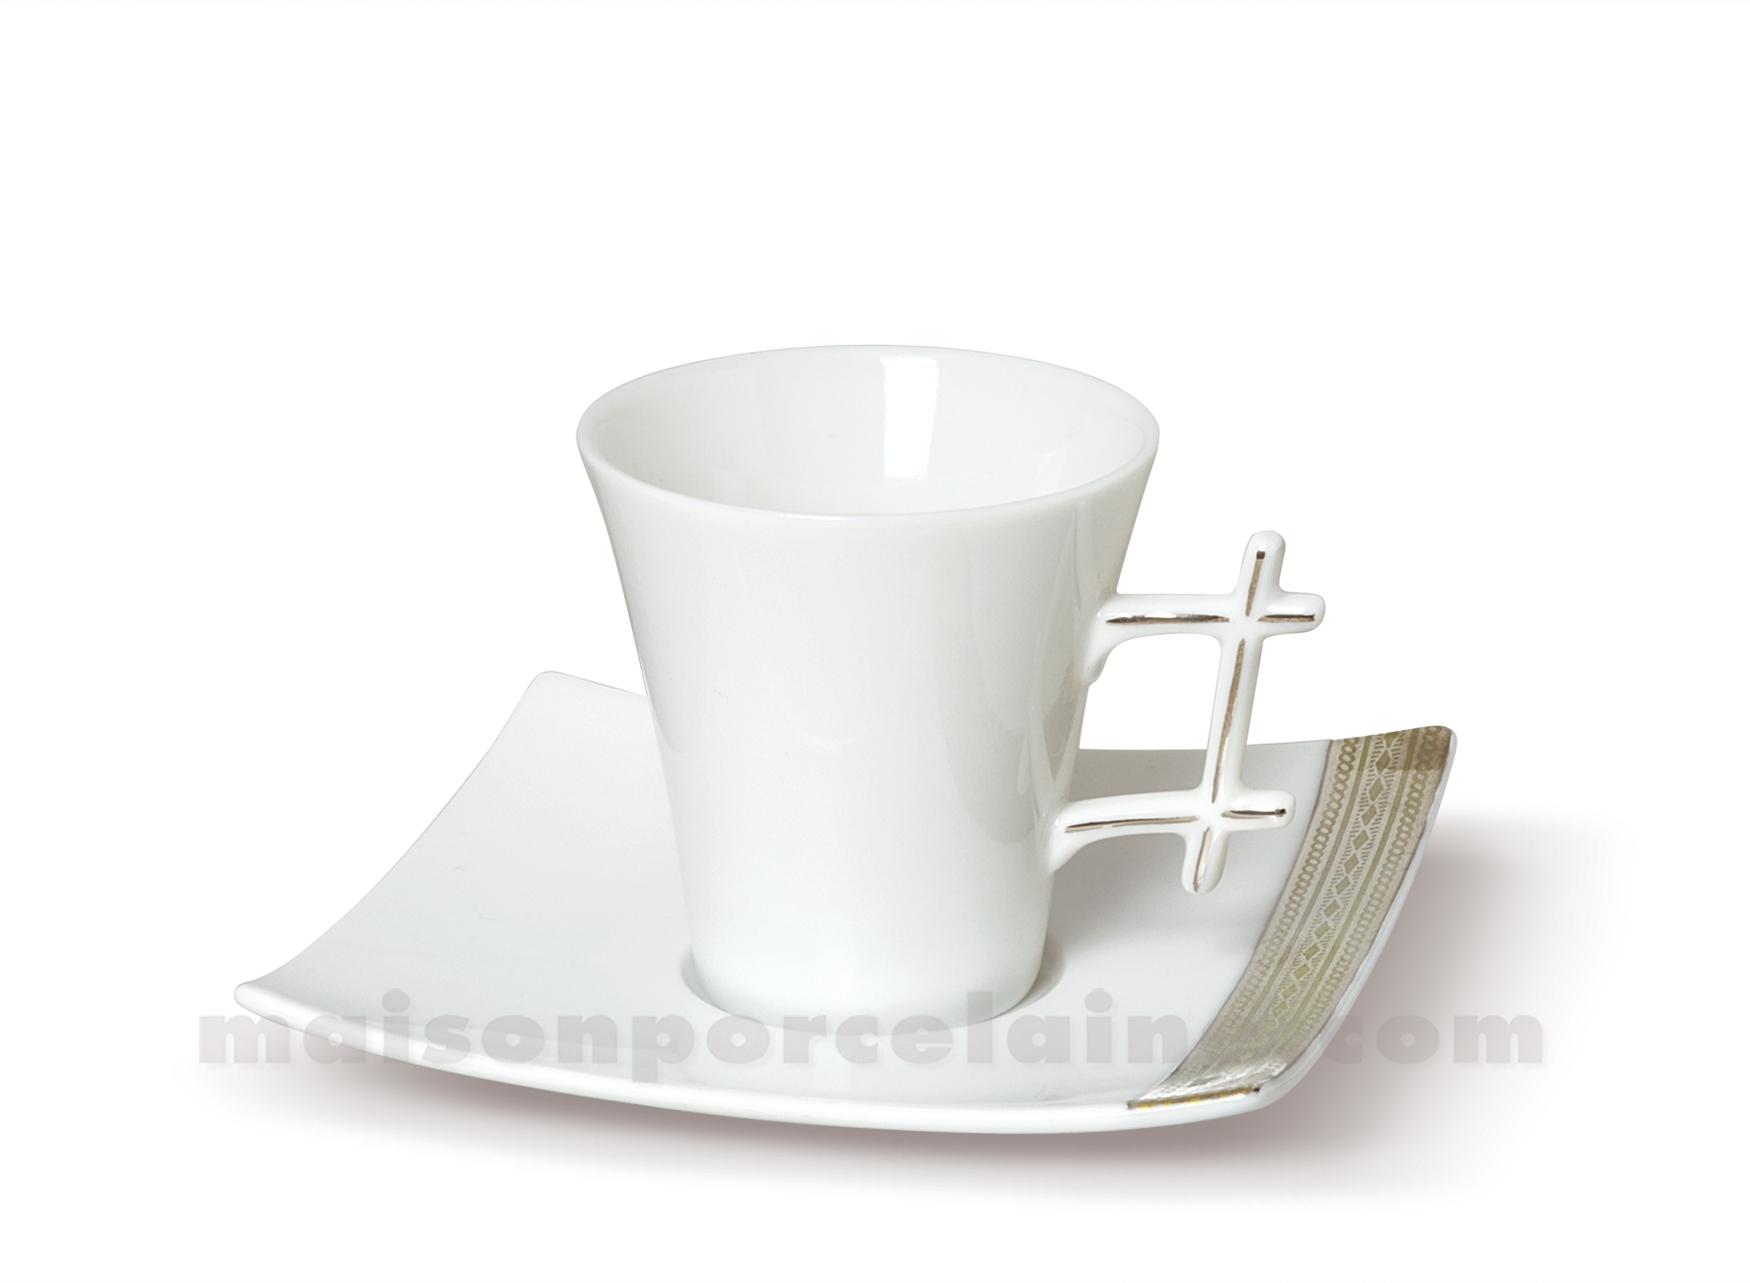 tasse cafe soucoupe limoges oxygene 10cl maison de la porcelaine. Black Bedroom Furniture Sets. Home Design Ideas